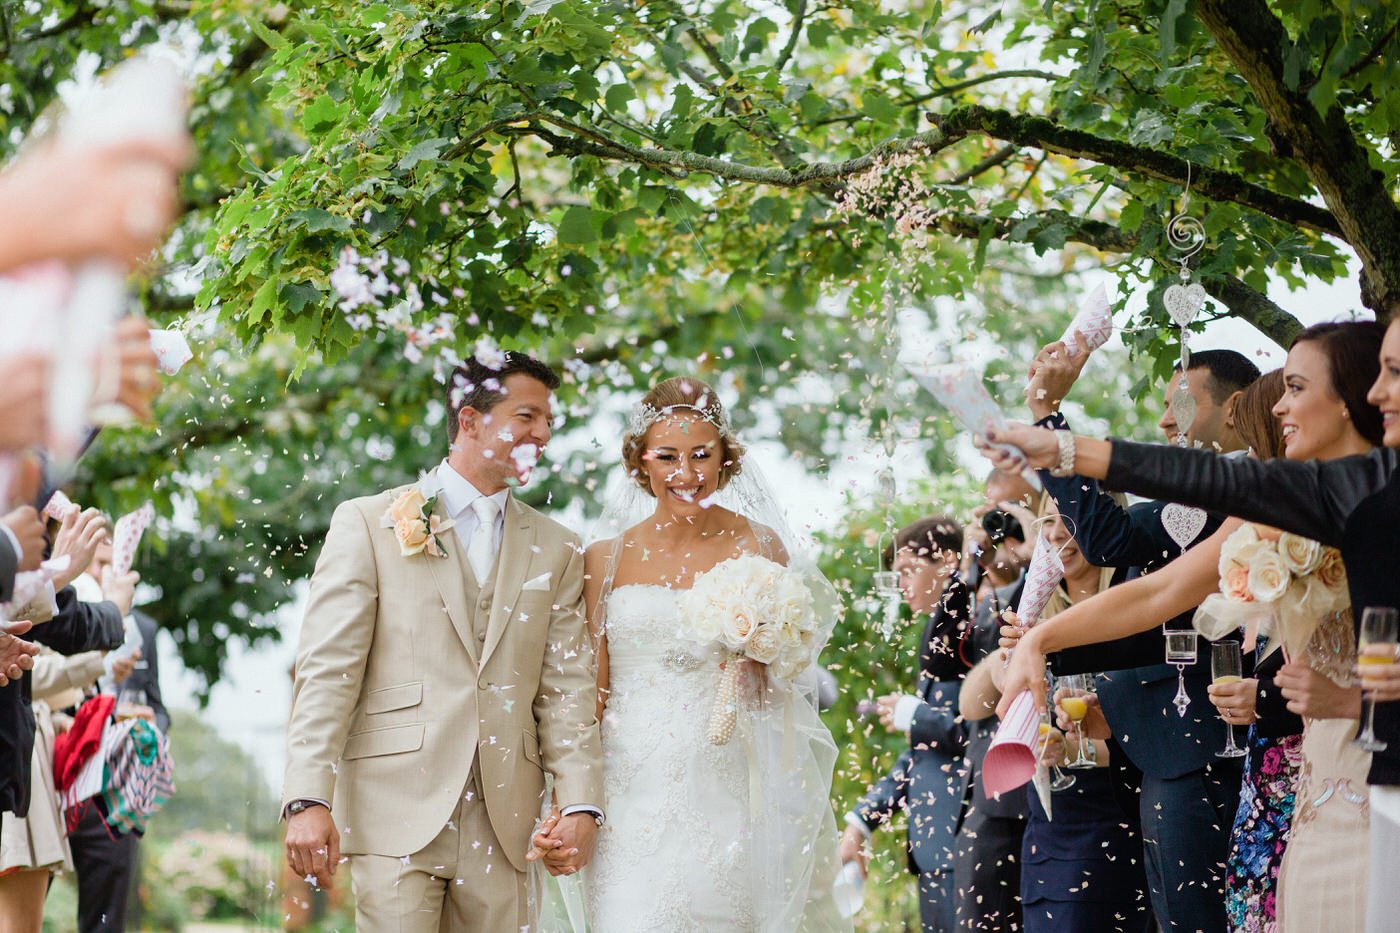 gaynes-park-wedding-photography-21.JPG